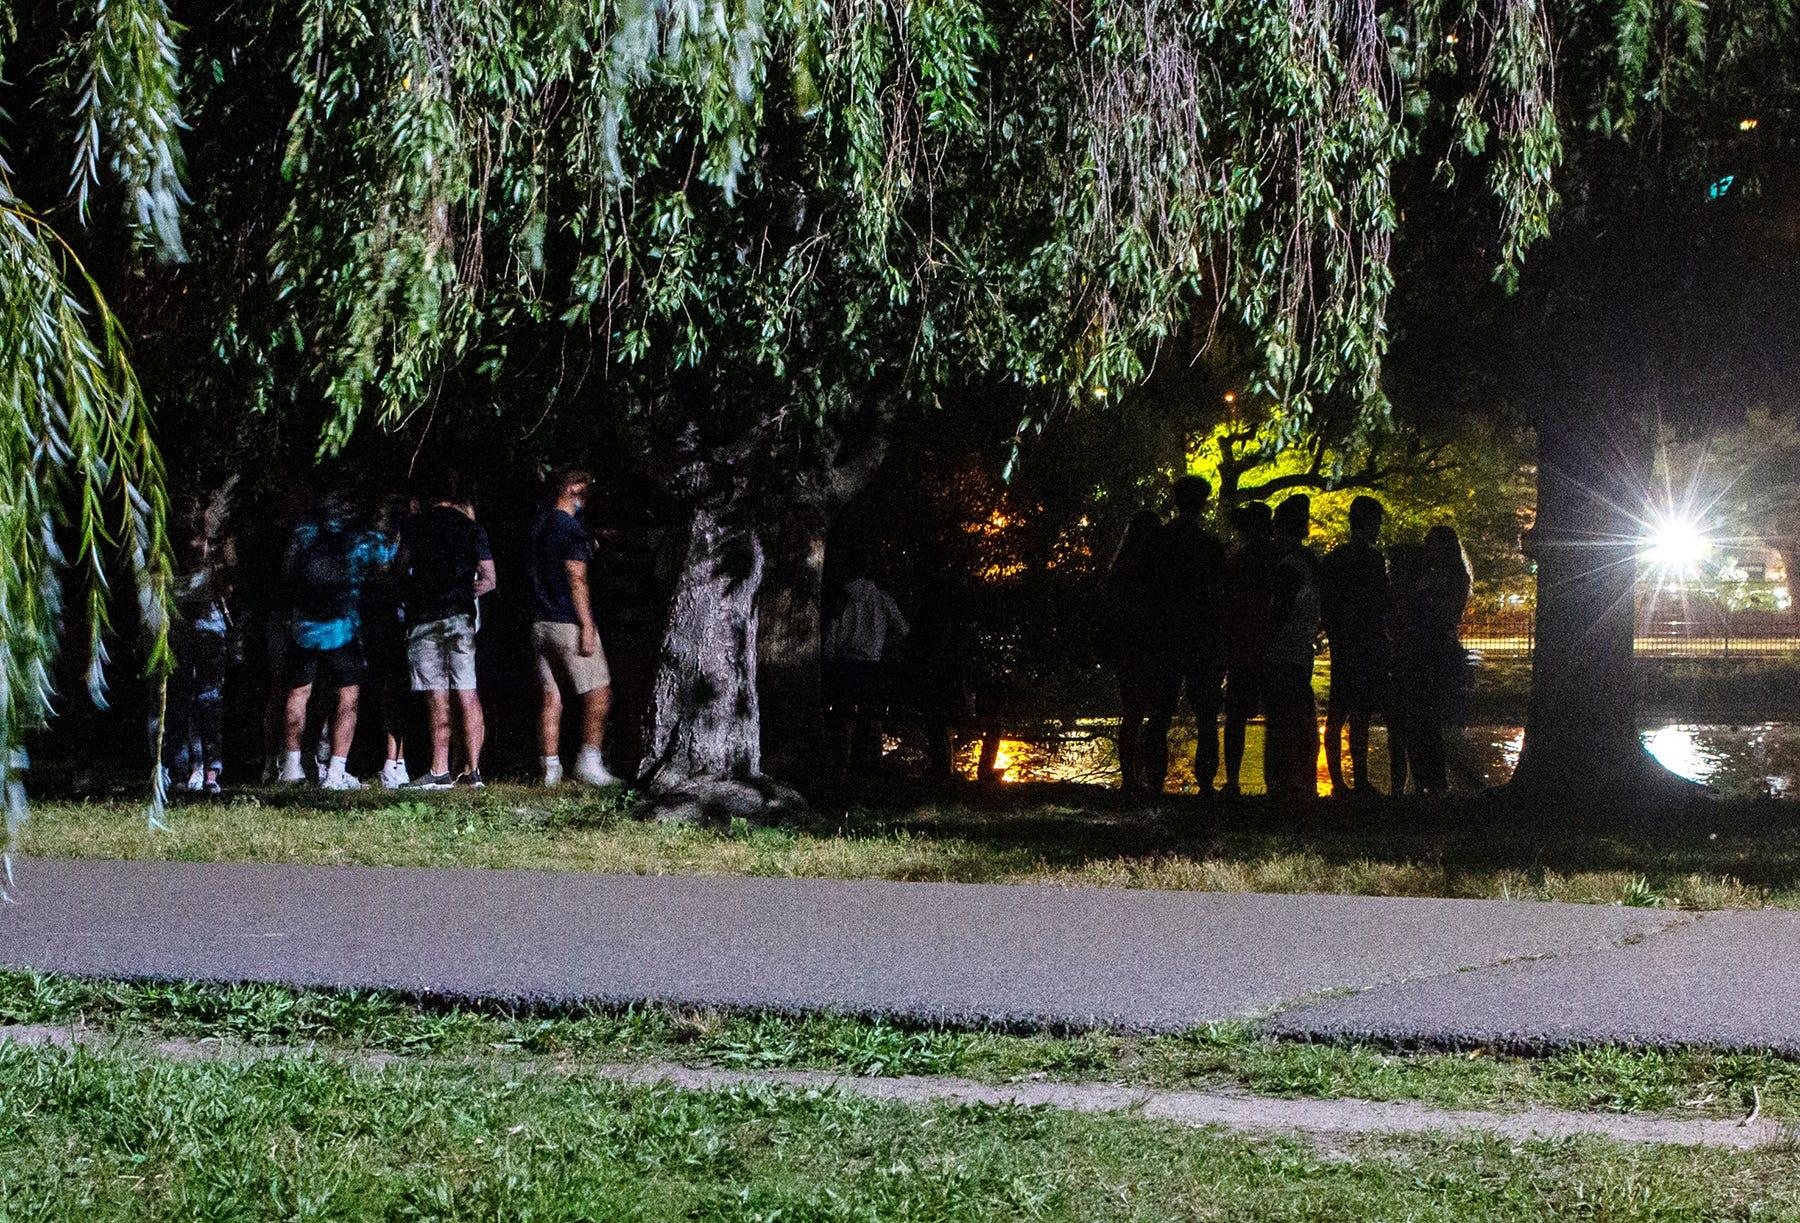 Boston University and Northeastern University students gather on the Charles River Esplanade on Friday.